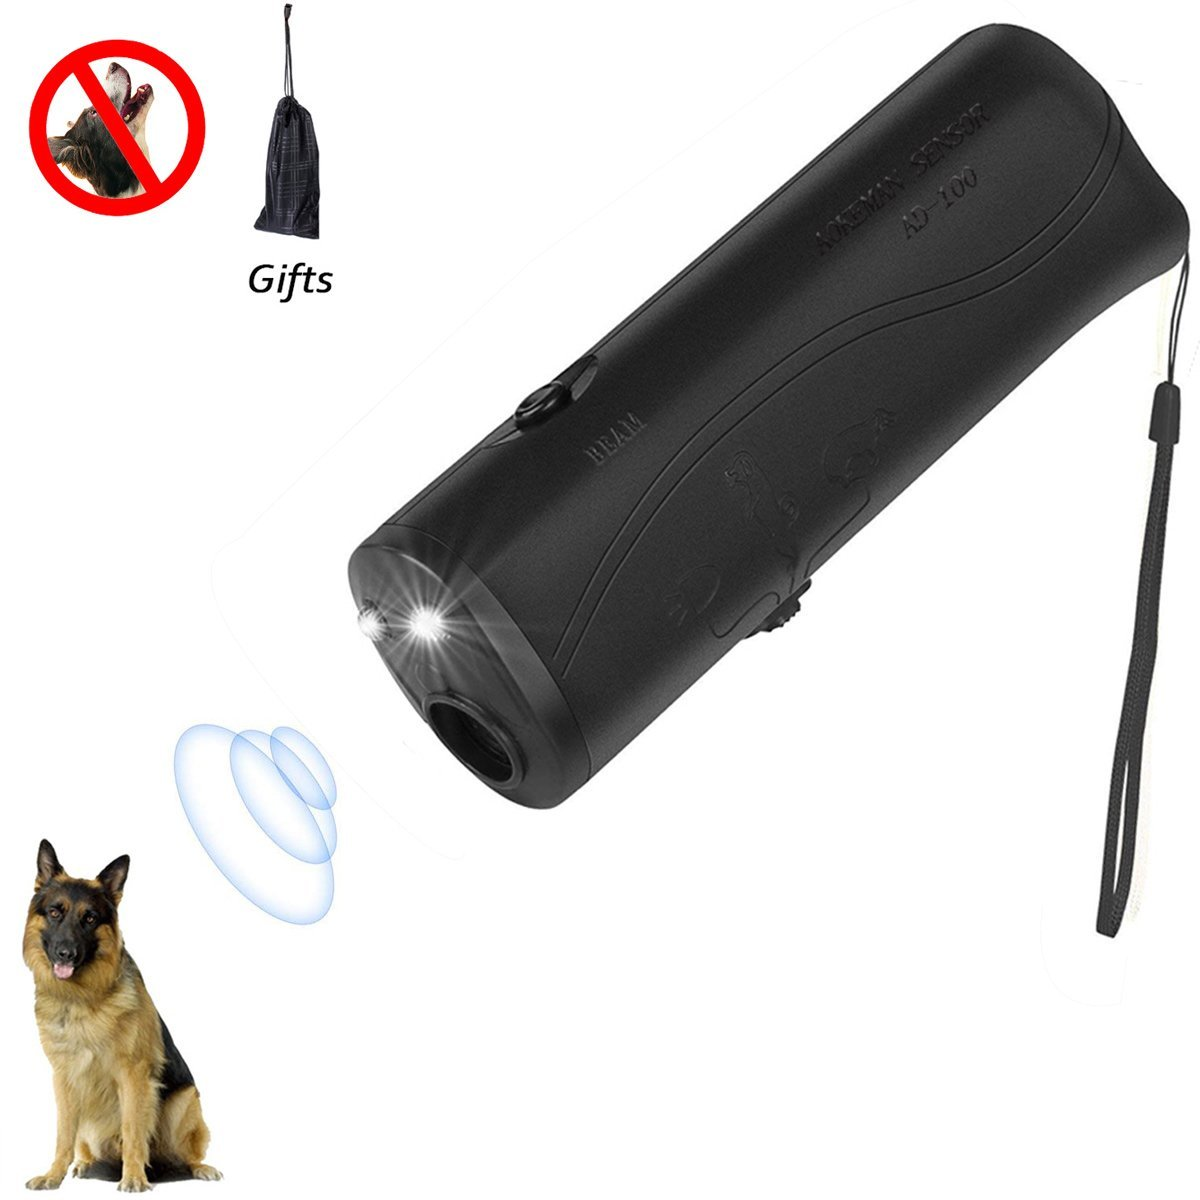 Believeee Dog Barking Stop 3 in 1 Anti Ultrasonic Dog Repeller Bark Handheld Dog Trainer Device Safe Pet Training Devices (Black)